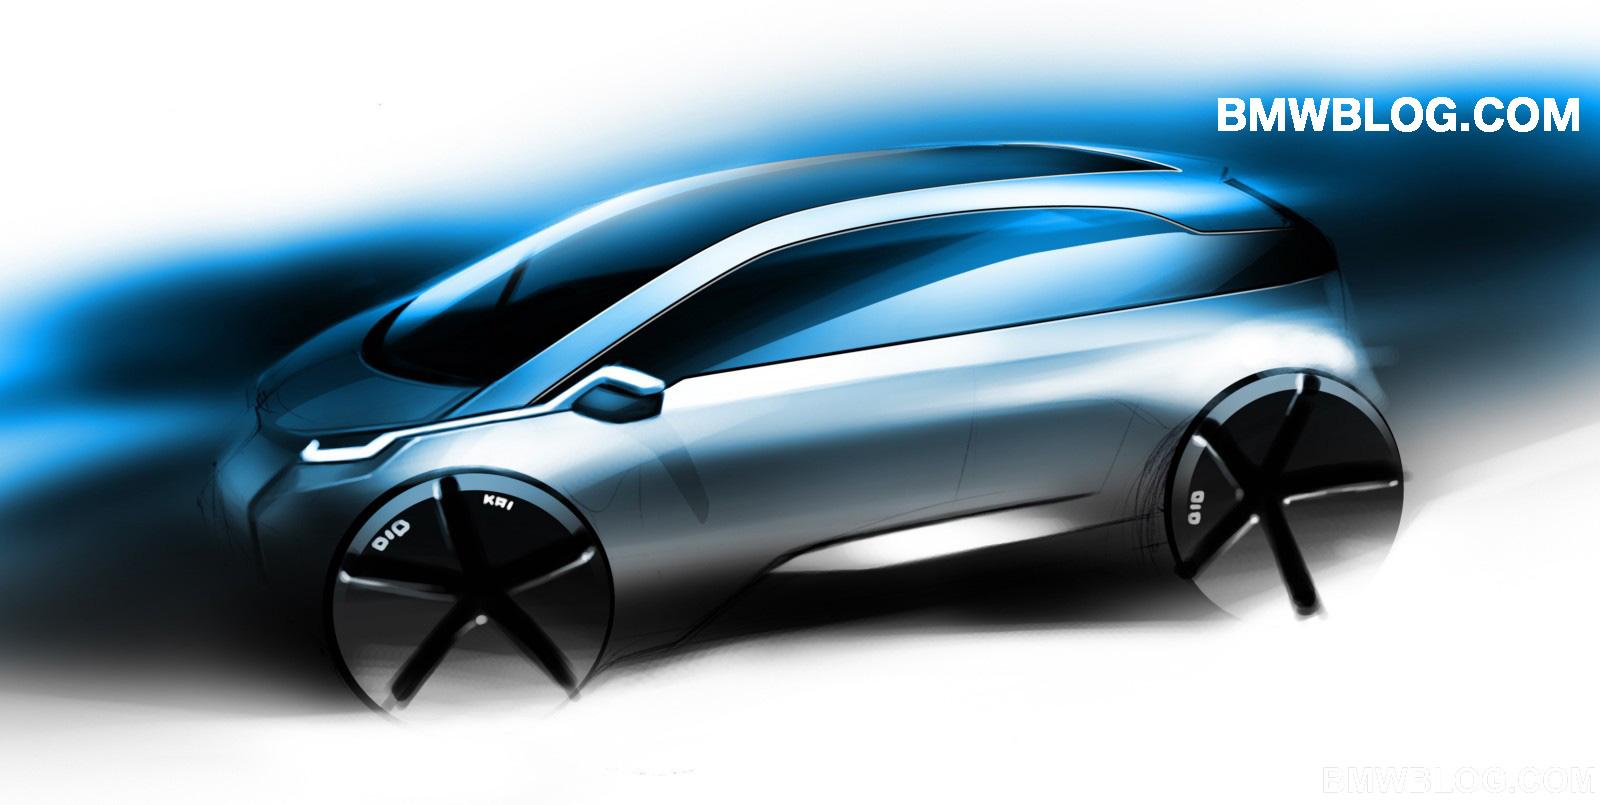 bmw megacity car electric